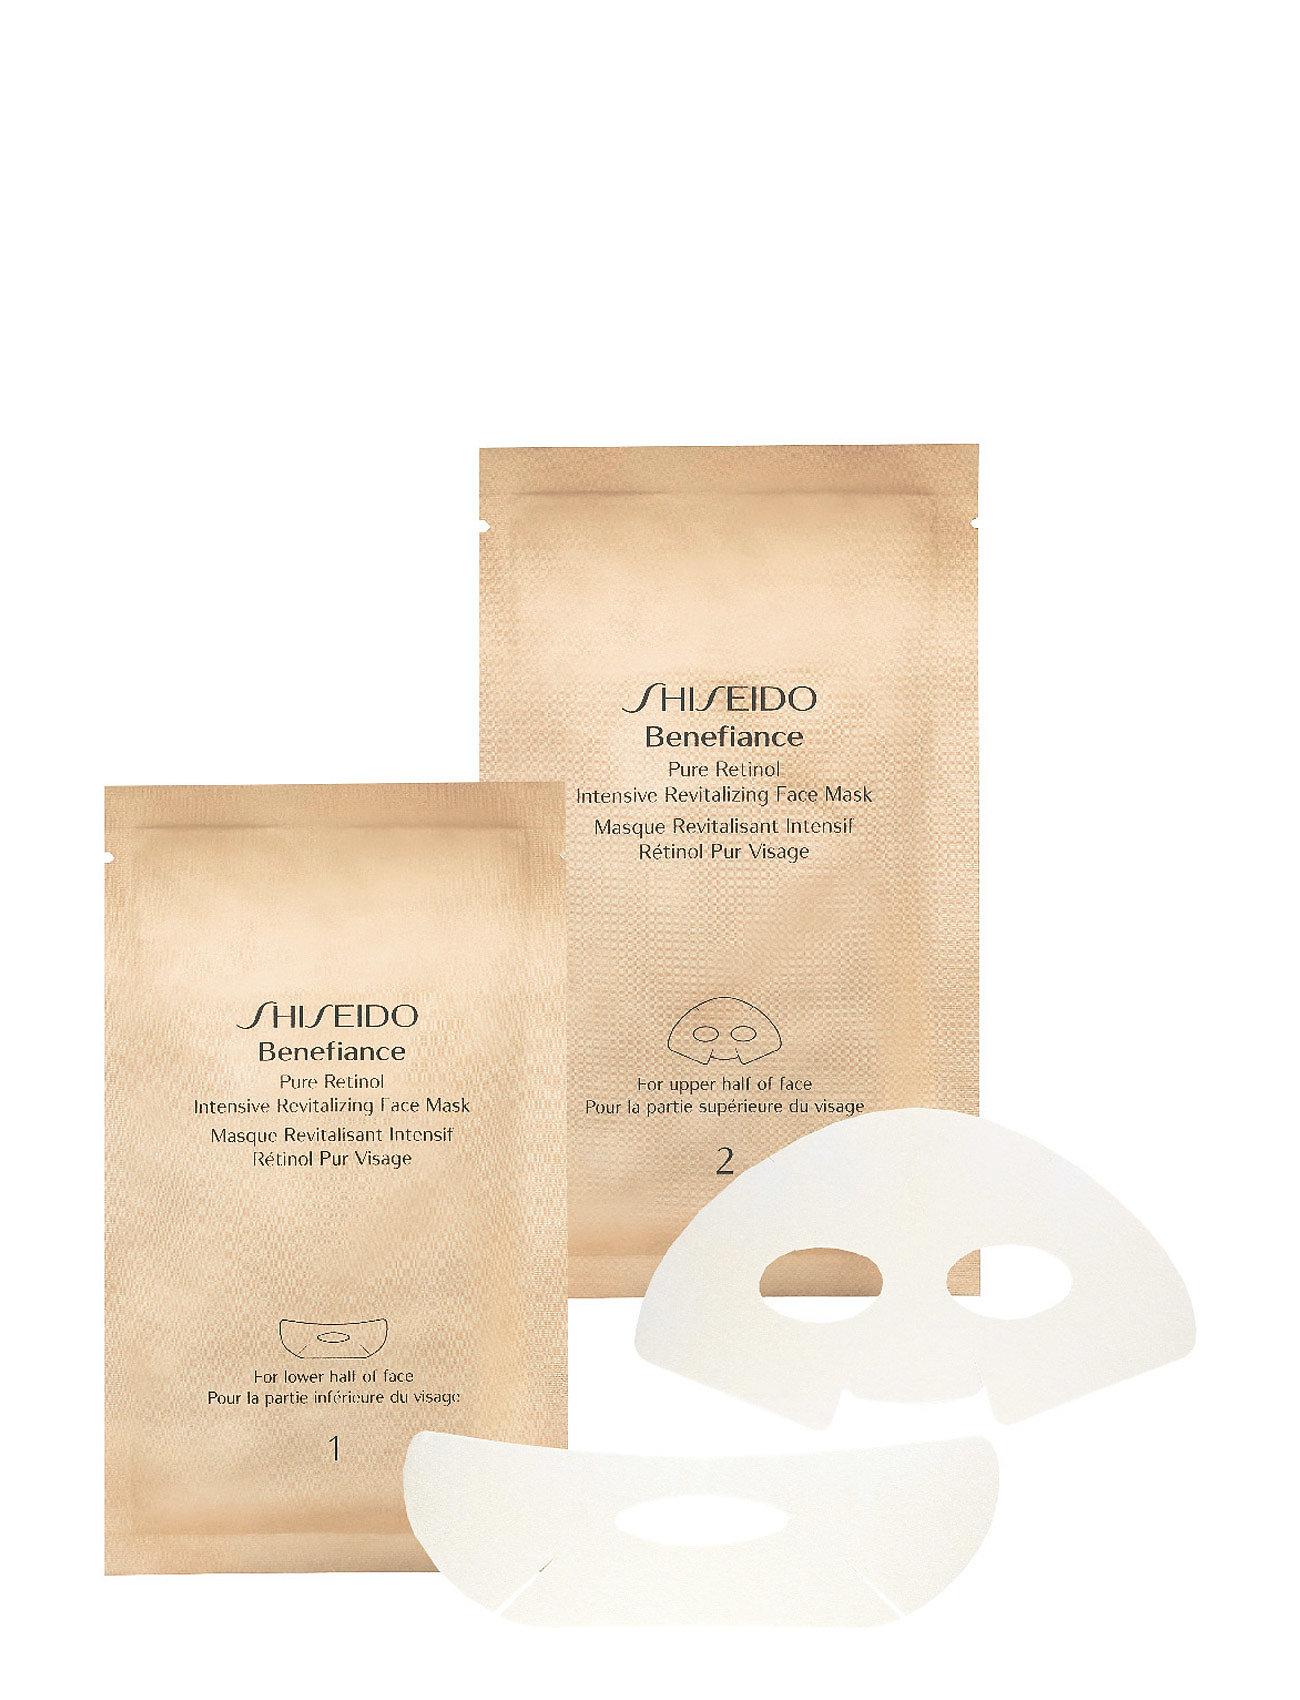 shiseido – Shiseido benefiance pure retinol in fra boozt.com dk